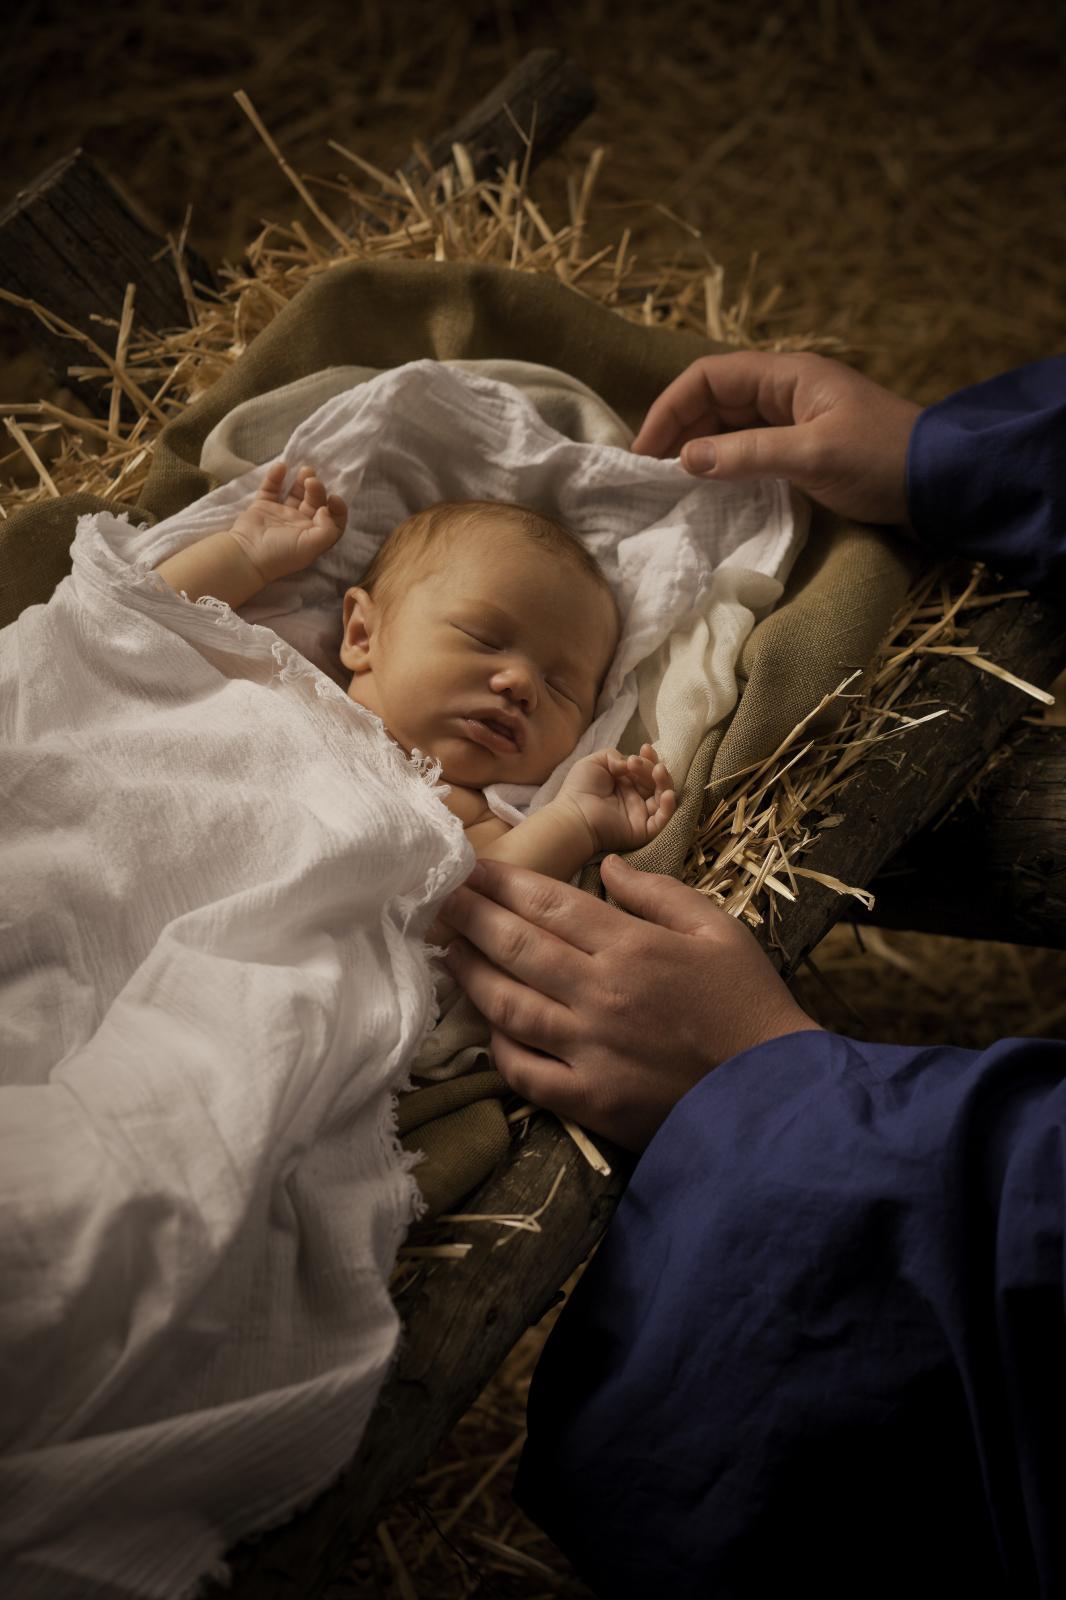 Baby jesus - Child jesus images download ...